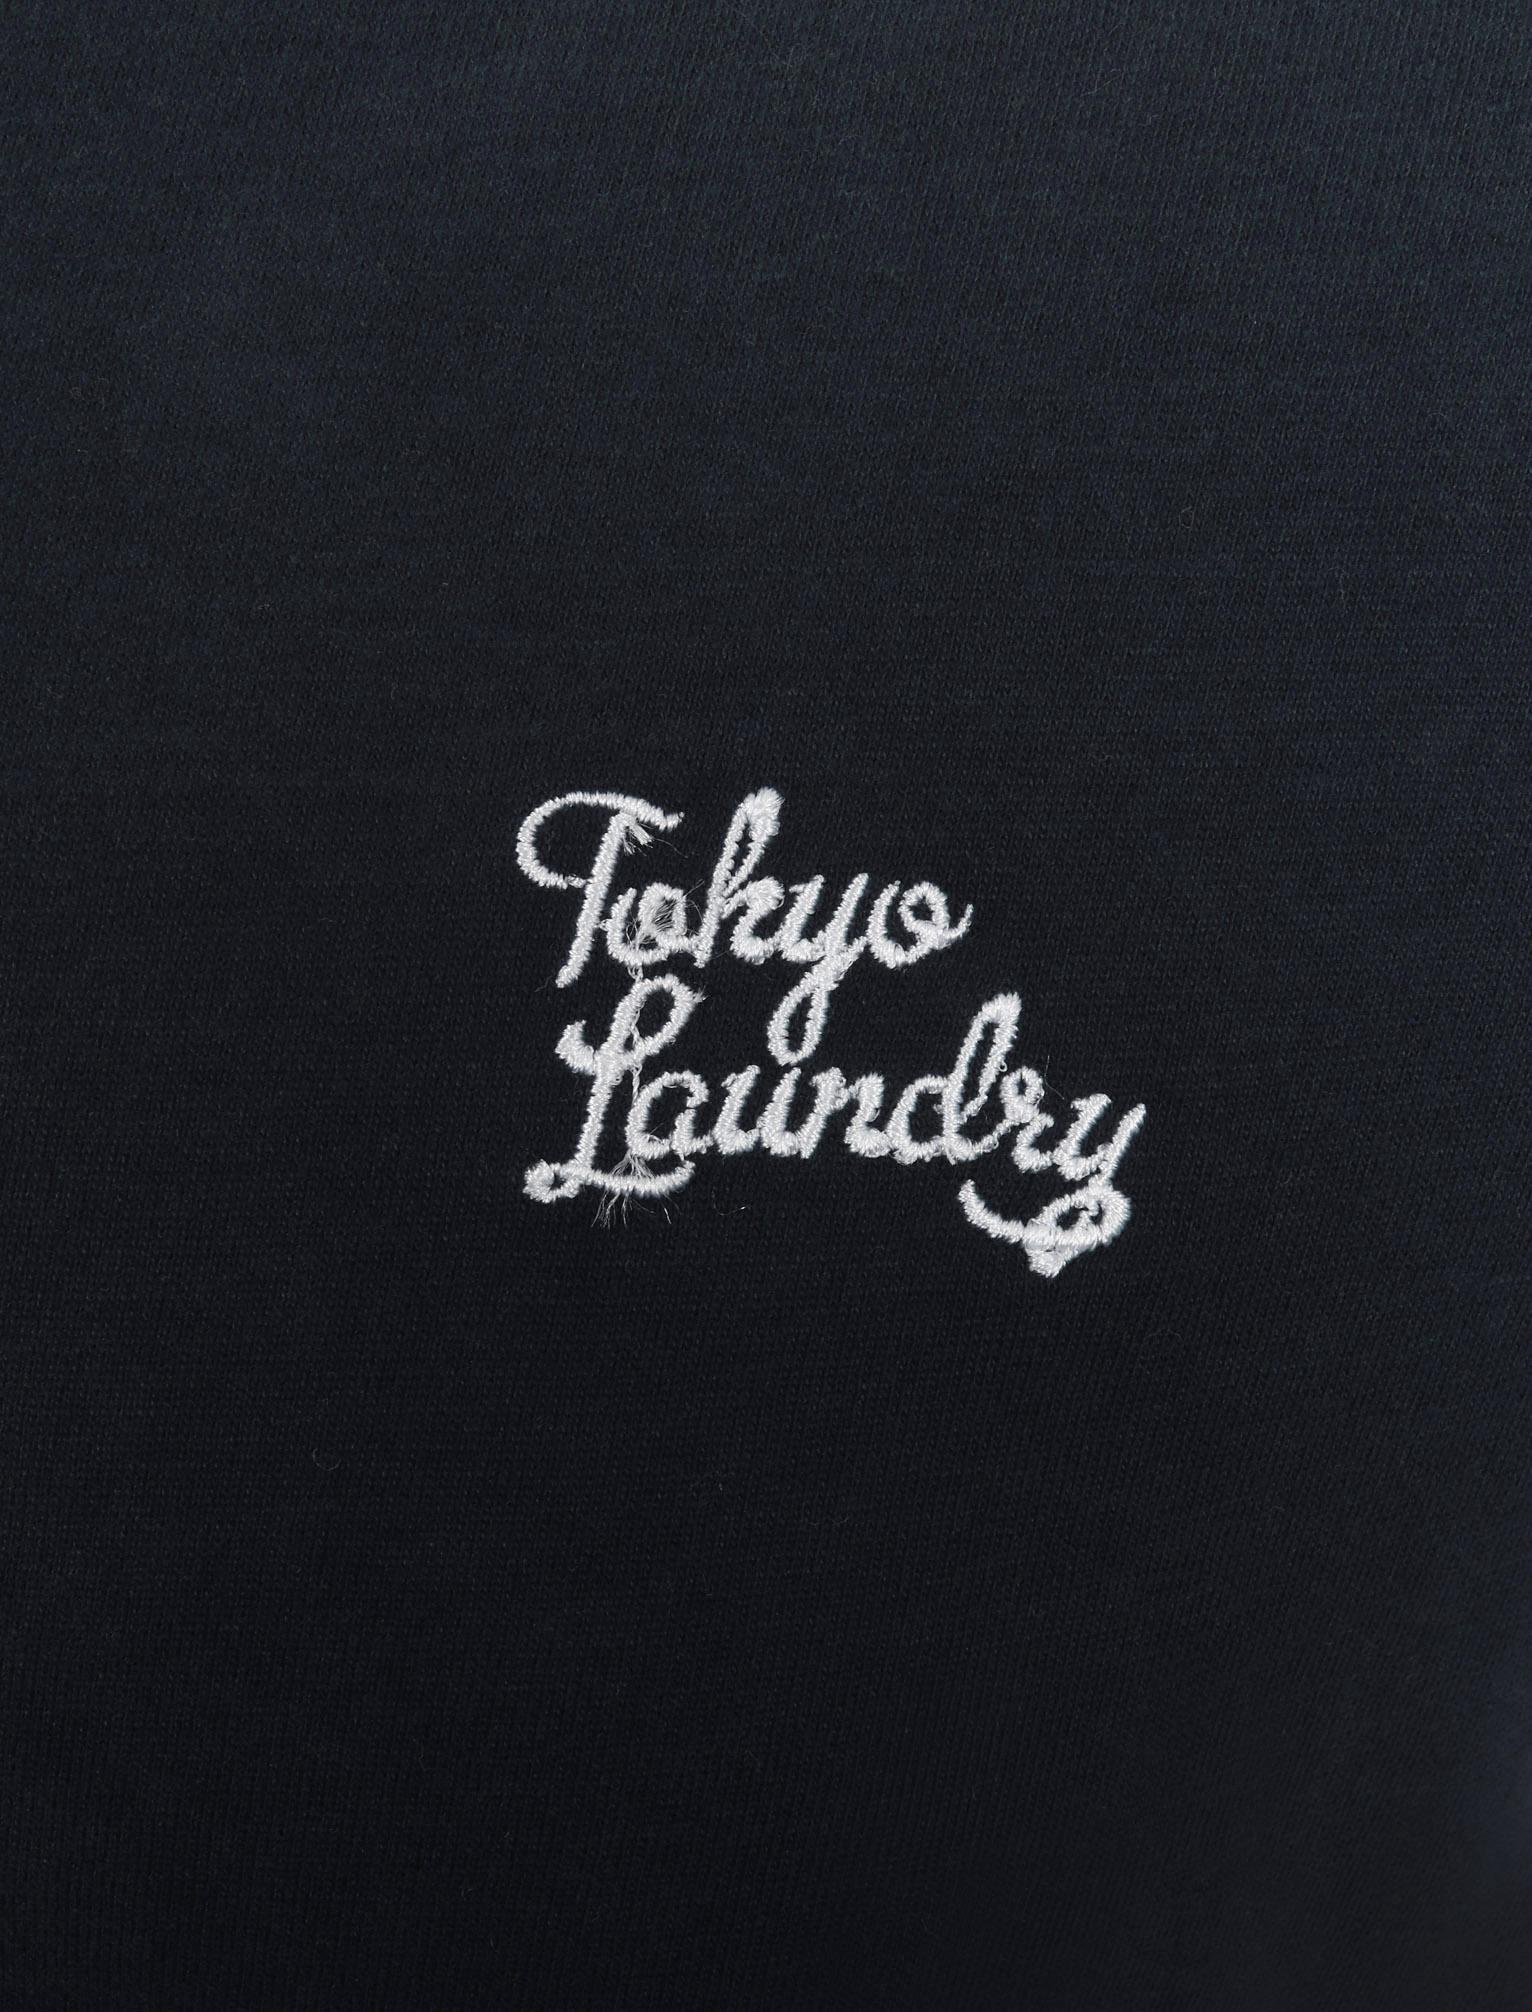 New-Mens-Tokyo-Laundry-Huson-Contrast-Crew-Neck-Cotton-Rich-T-Shirt-Size-S-XXL thumbnail 8